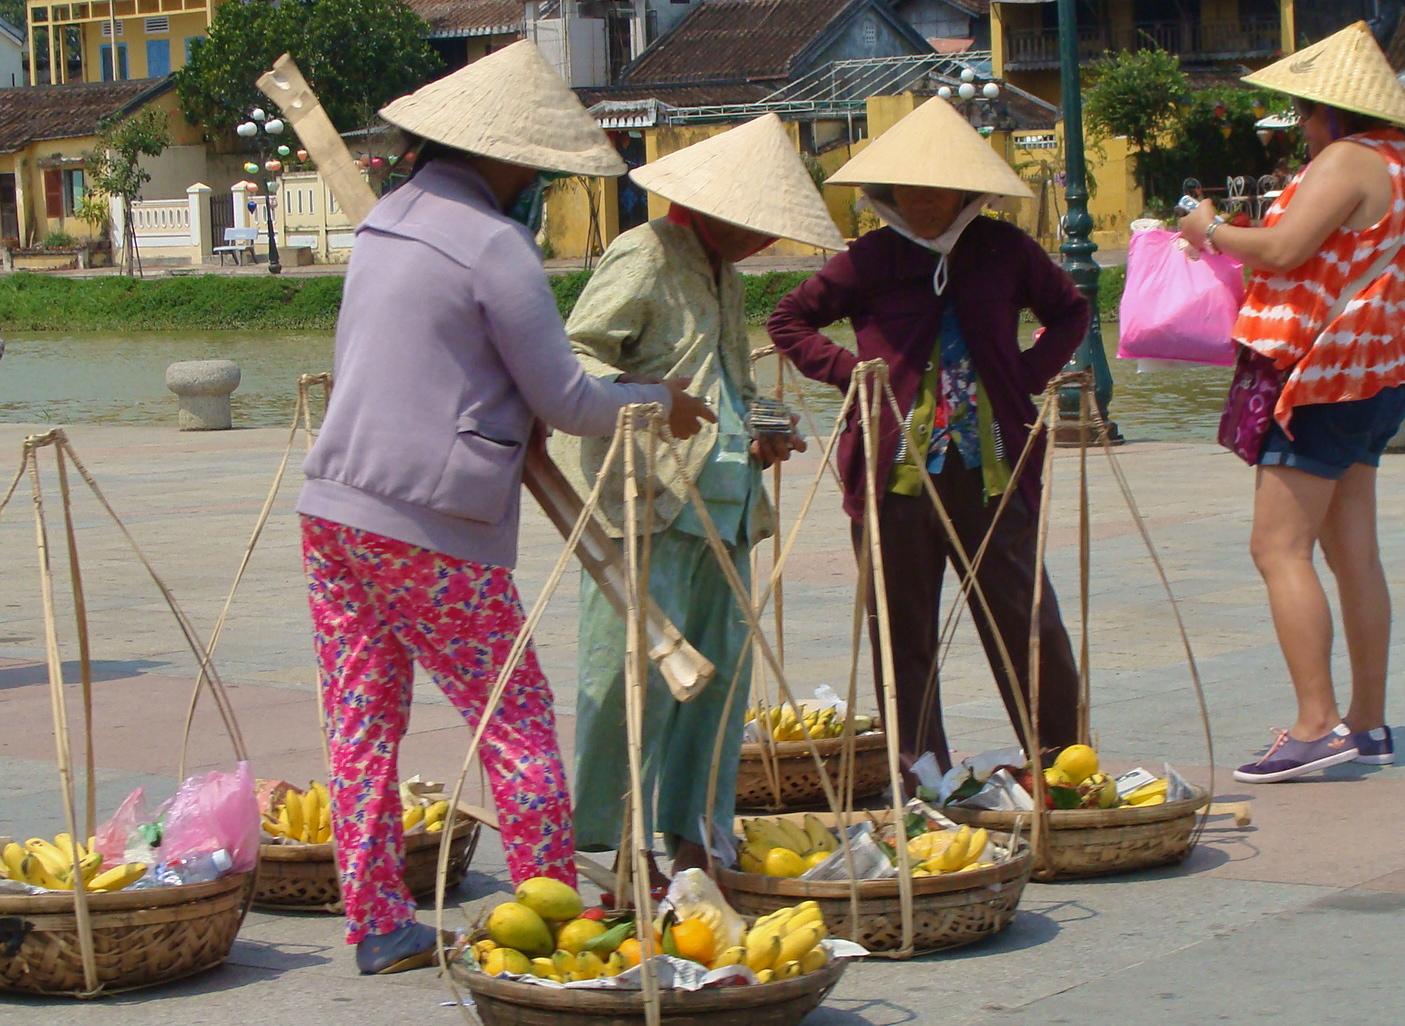 Selling their fruit in Hoi An, Vietnam.